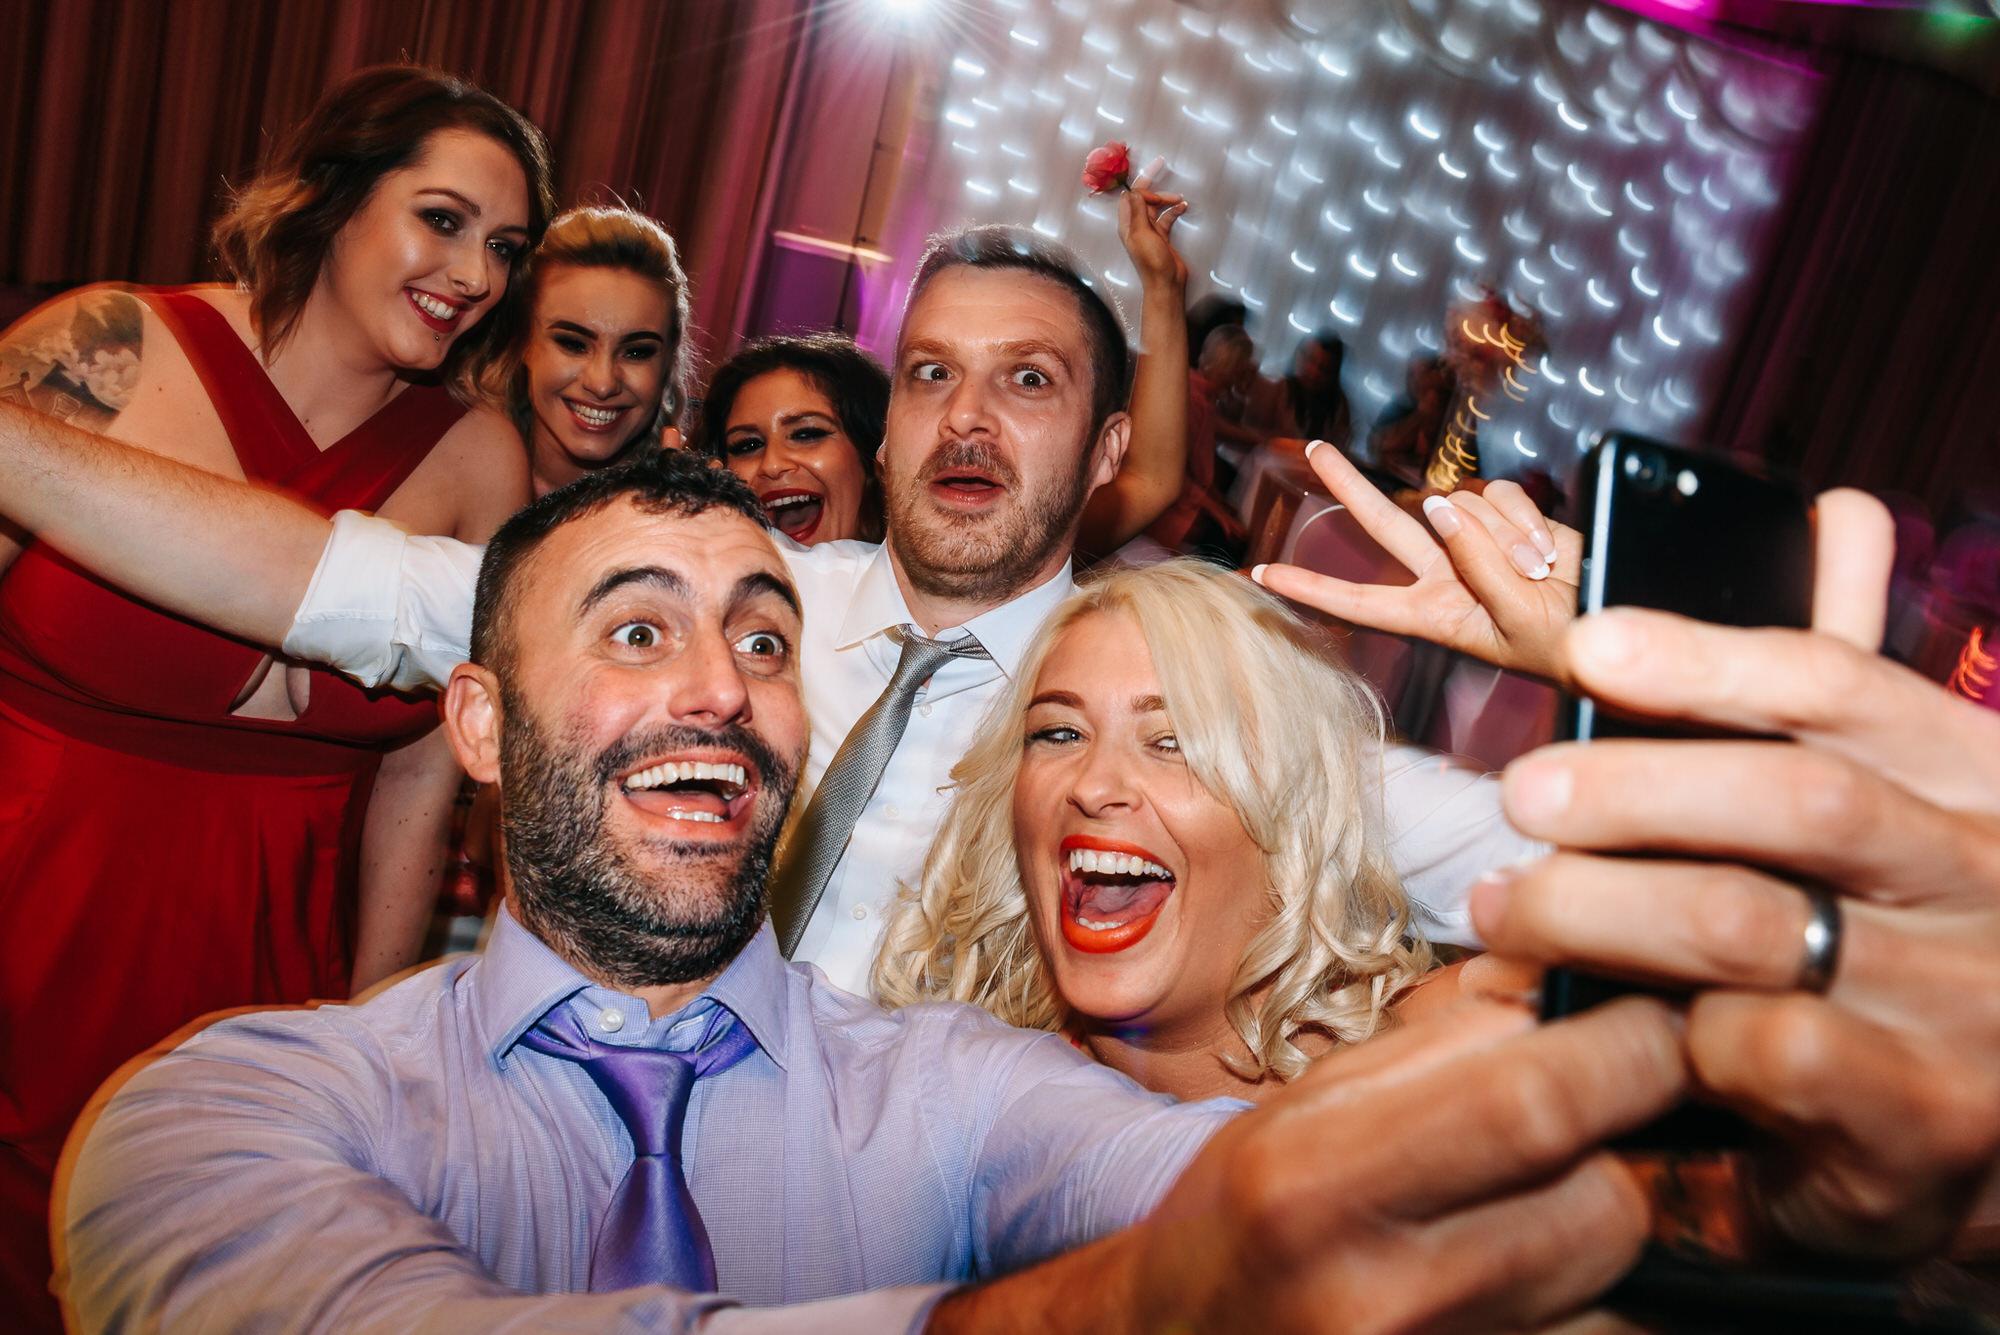 Best Of Yorkshire Wedding Photography 2017 - Martyn Hand-79.jpg